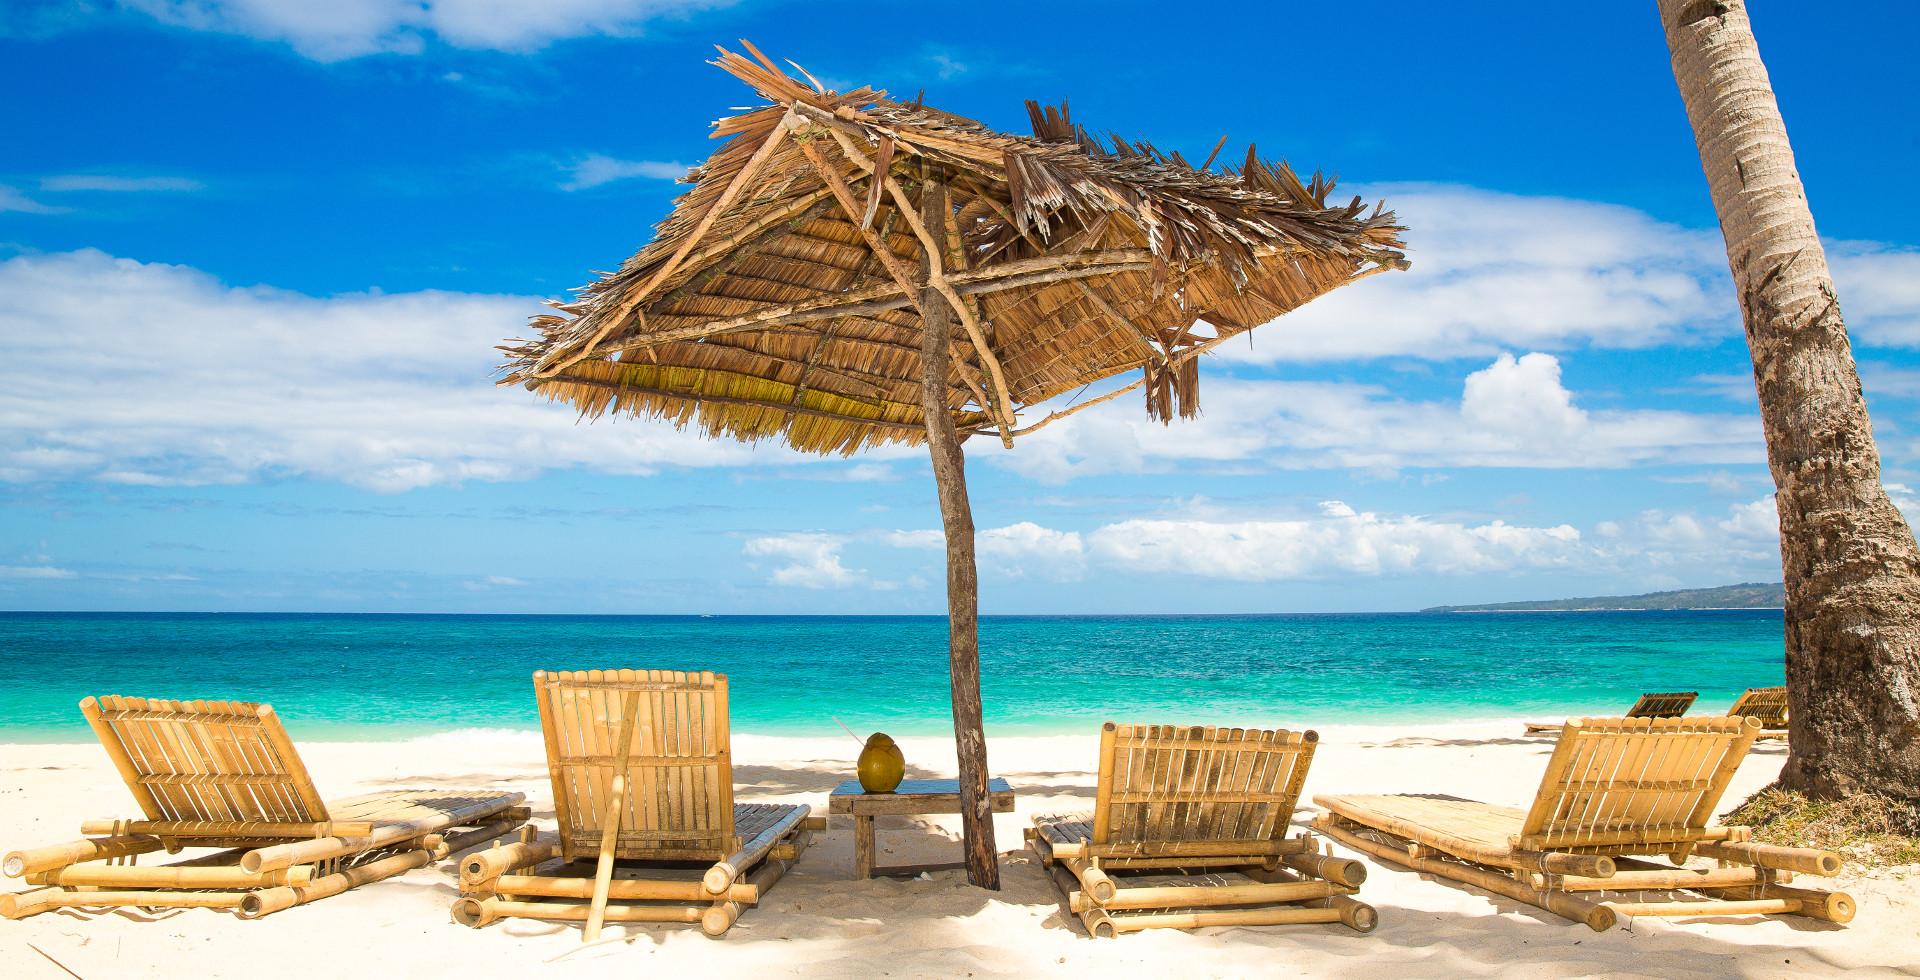 Sun umbrella and beach beds on tropical beach. Summer vacantion concept.